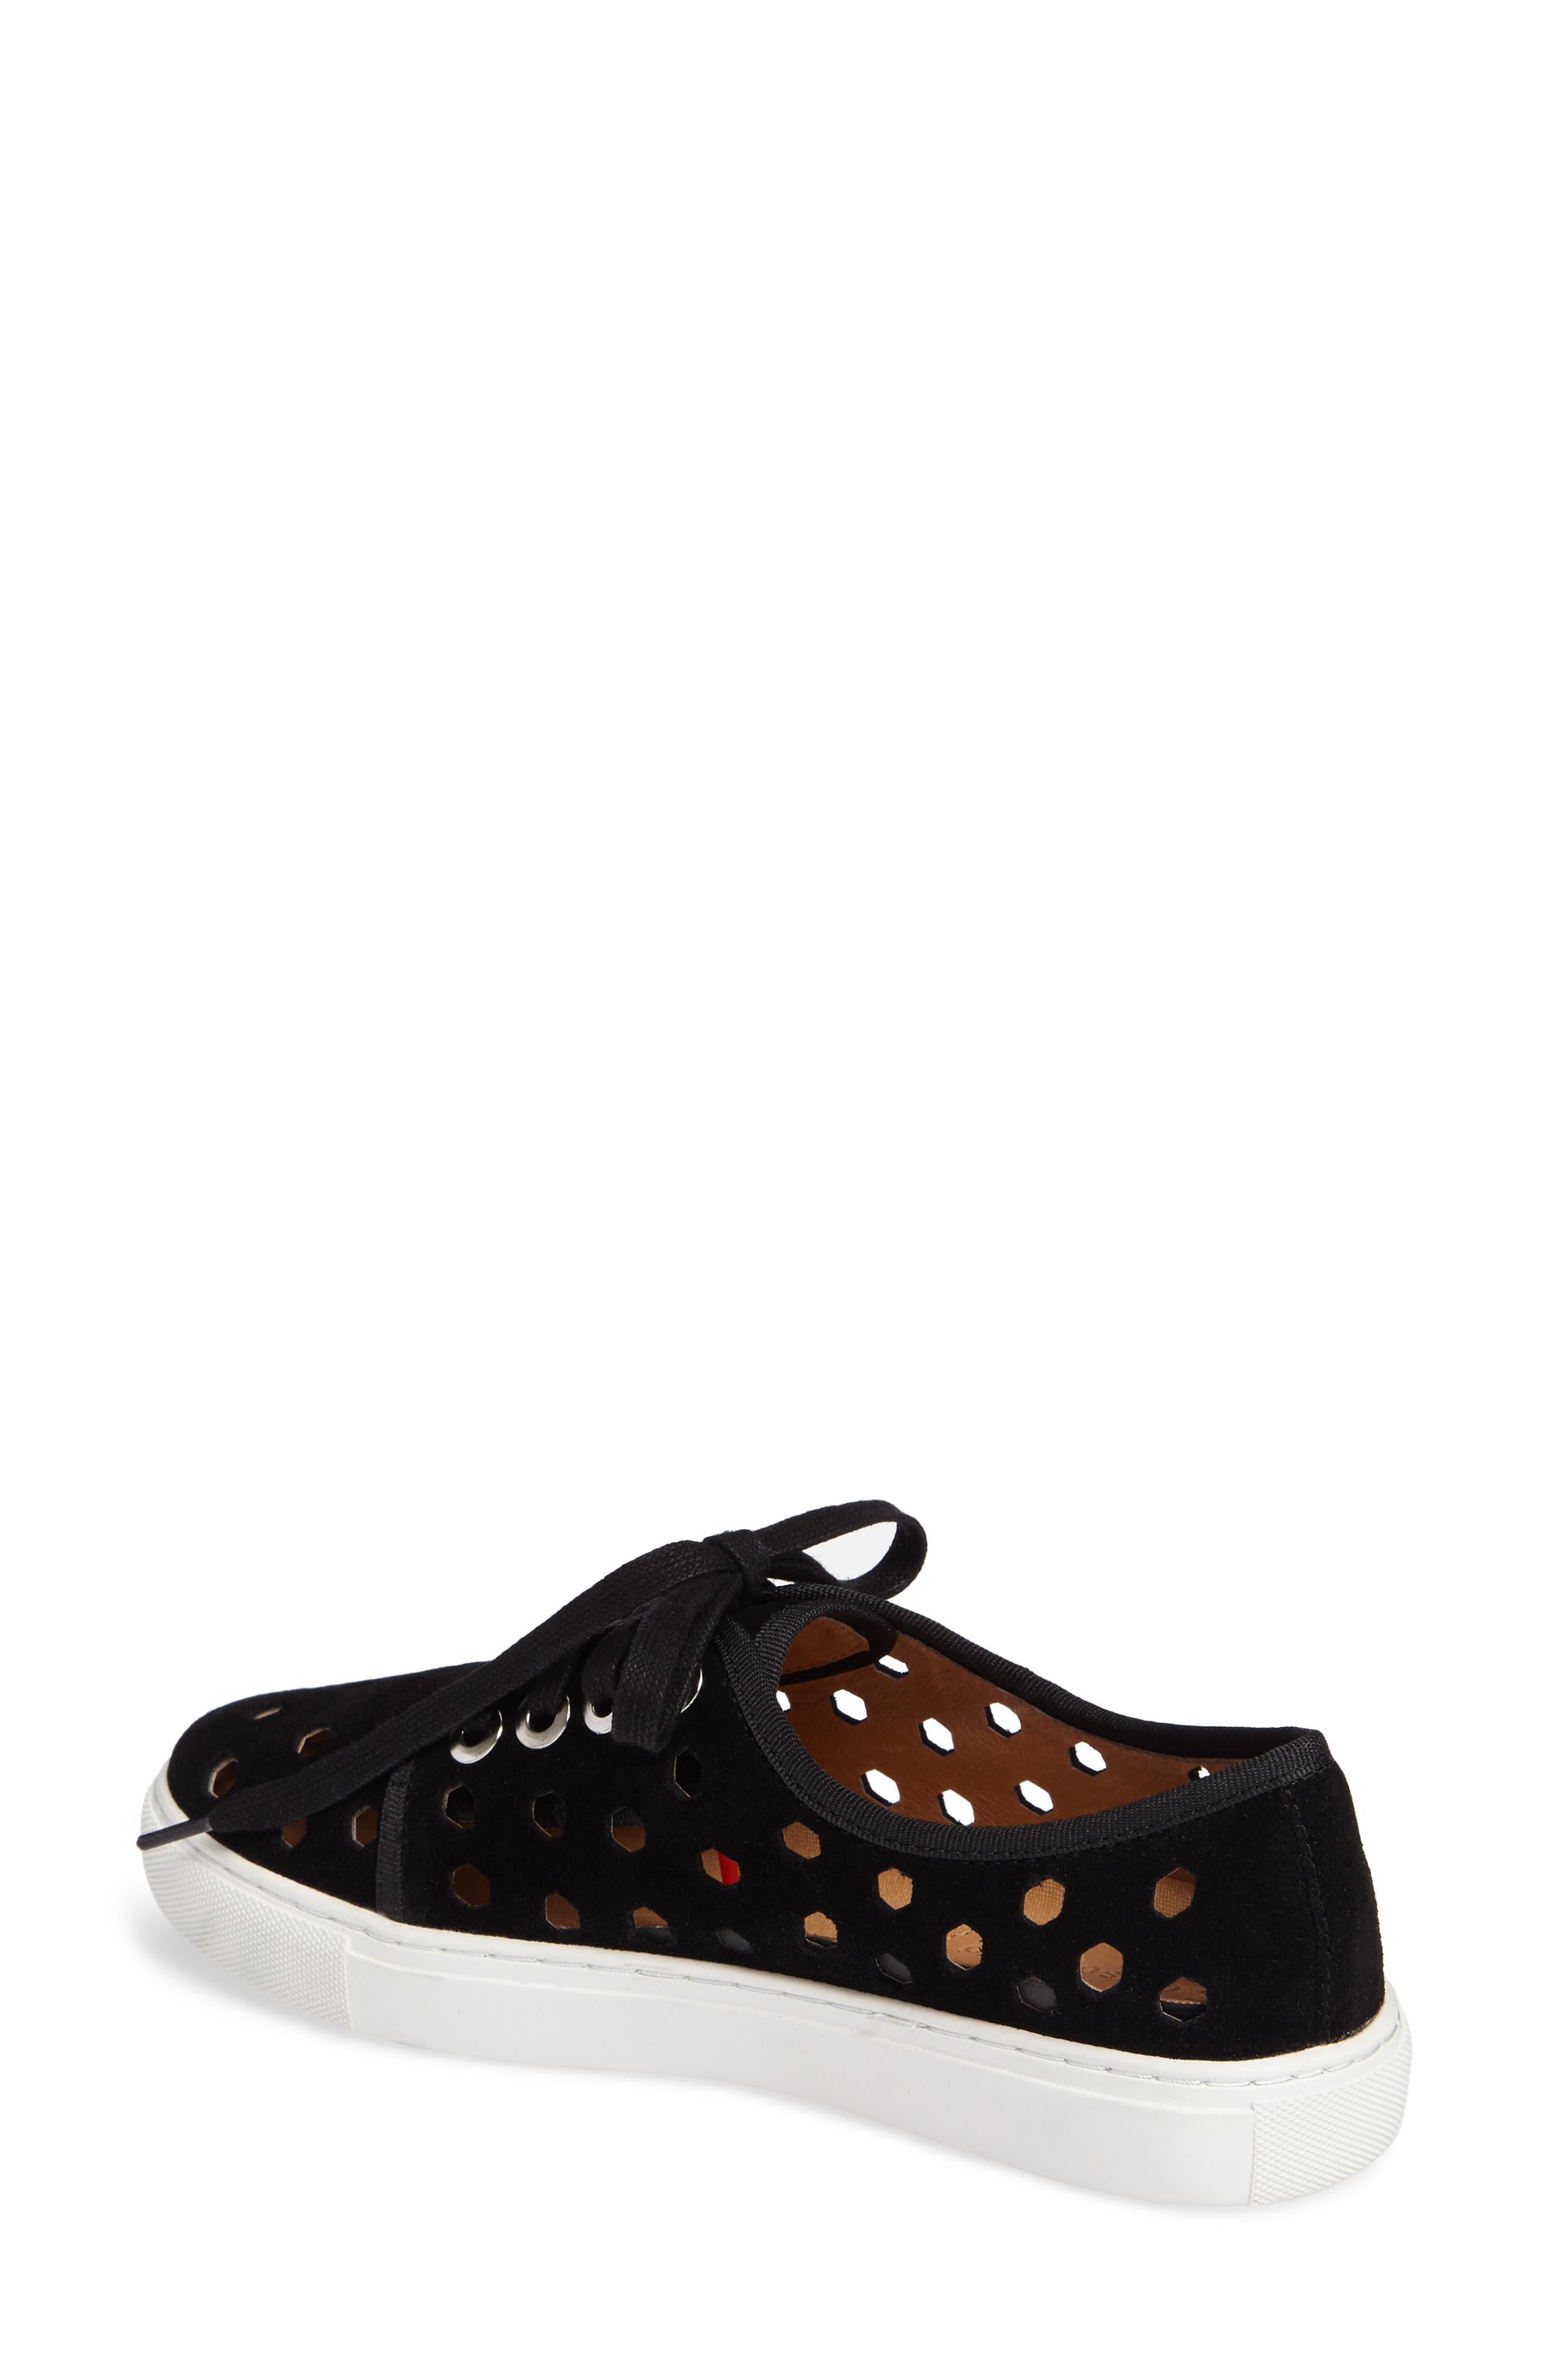 Alternate Image 2  - Corso Como Rasta Perforated Sneaker (Women)